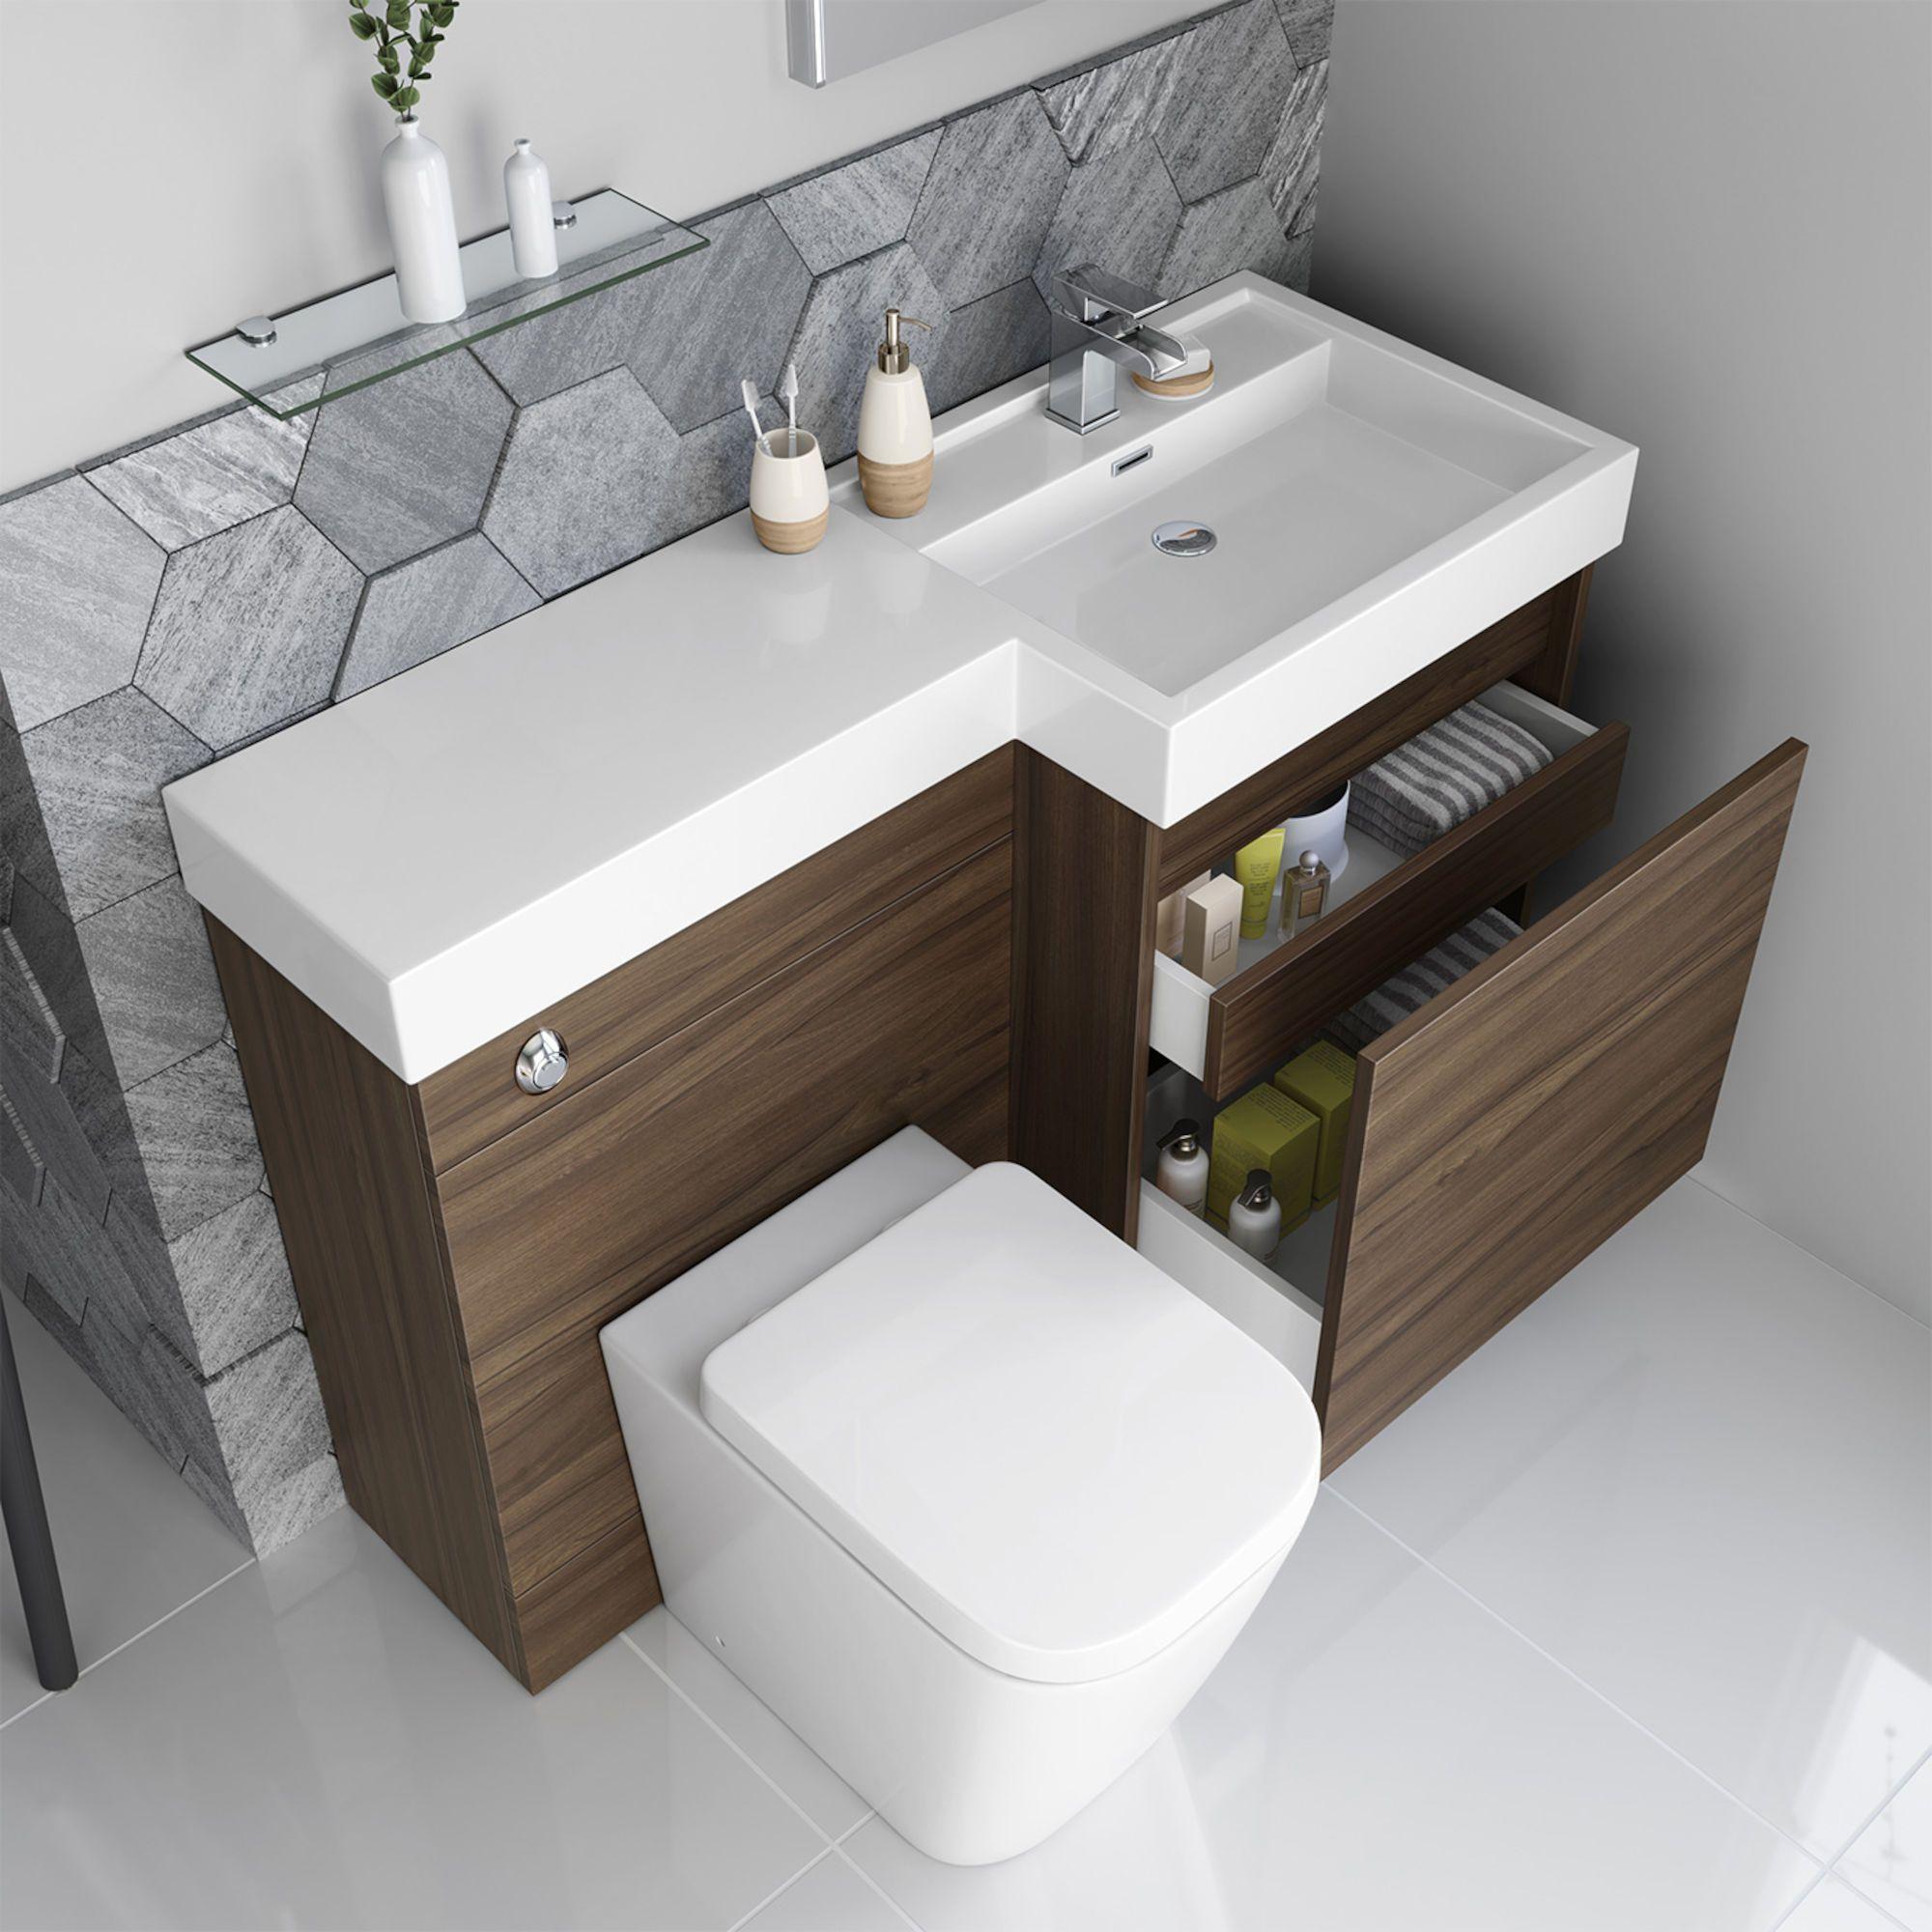 1206mm Olympia Gloss Walnut Drawer Vanity Unit Florence Pan Soak Com Bathroom Furniture Modern Small Bathroom Minimalist Bathroom Furniture